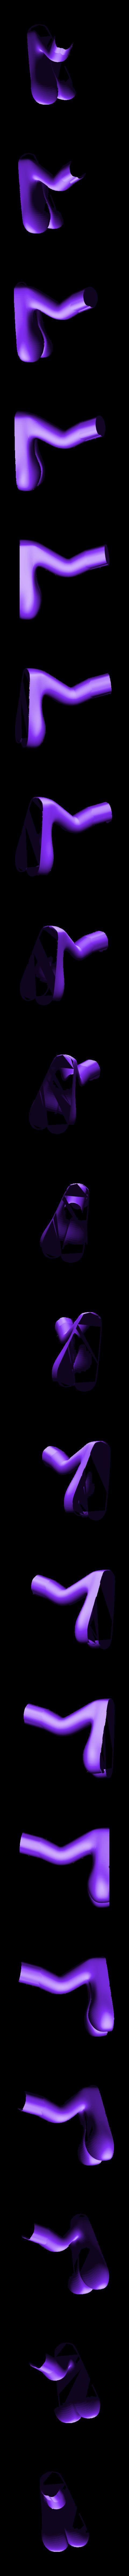 leg_left.stl Download free STL file Monster Tweety - multi-color • 3D print template, bpitanga